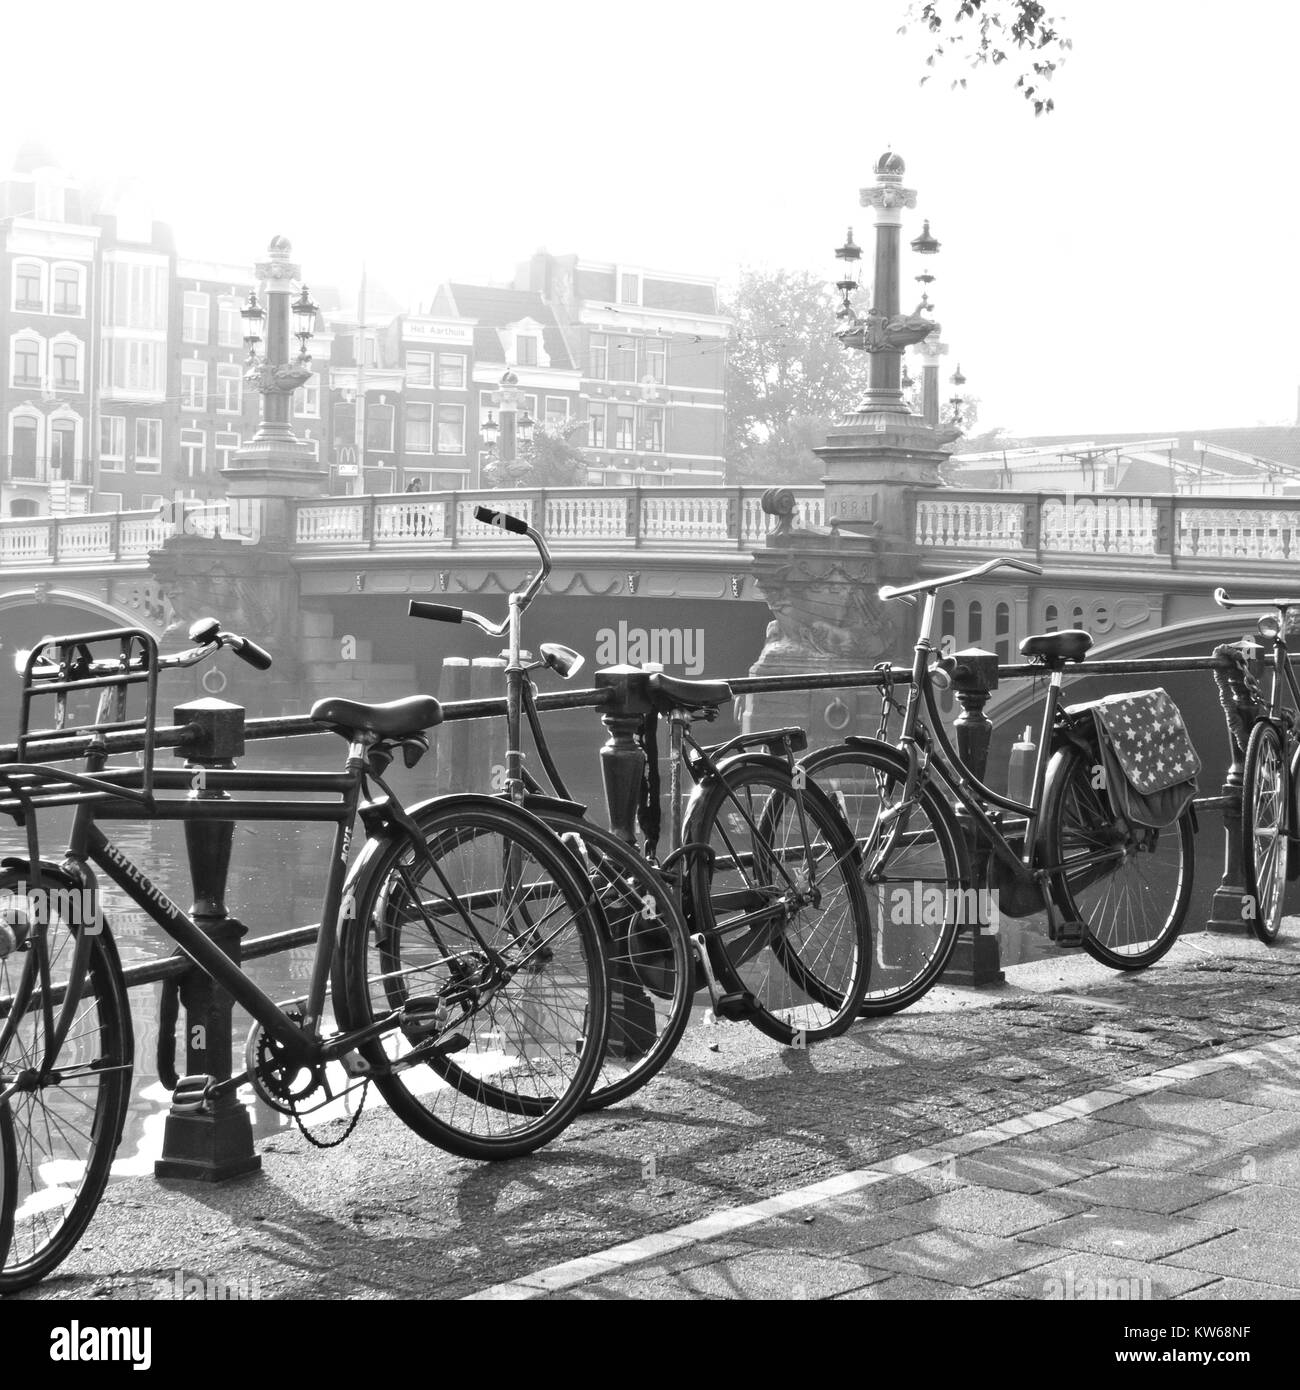 Old Amsterdam, bikes on bridge - Stock Image